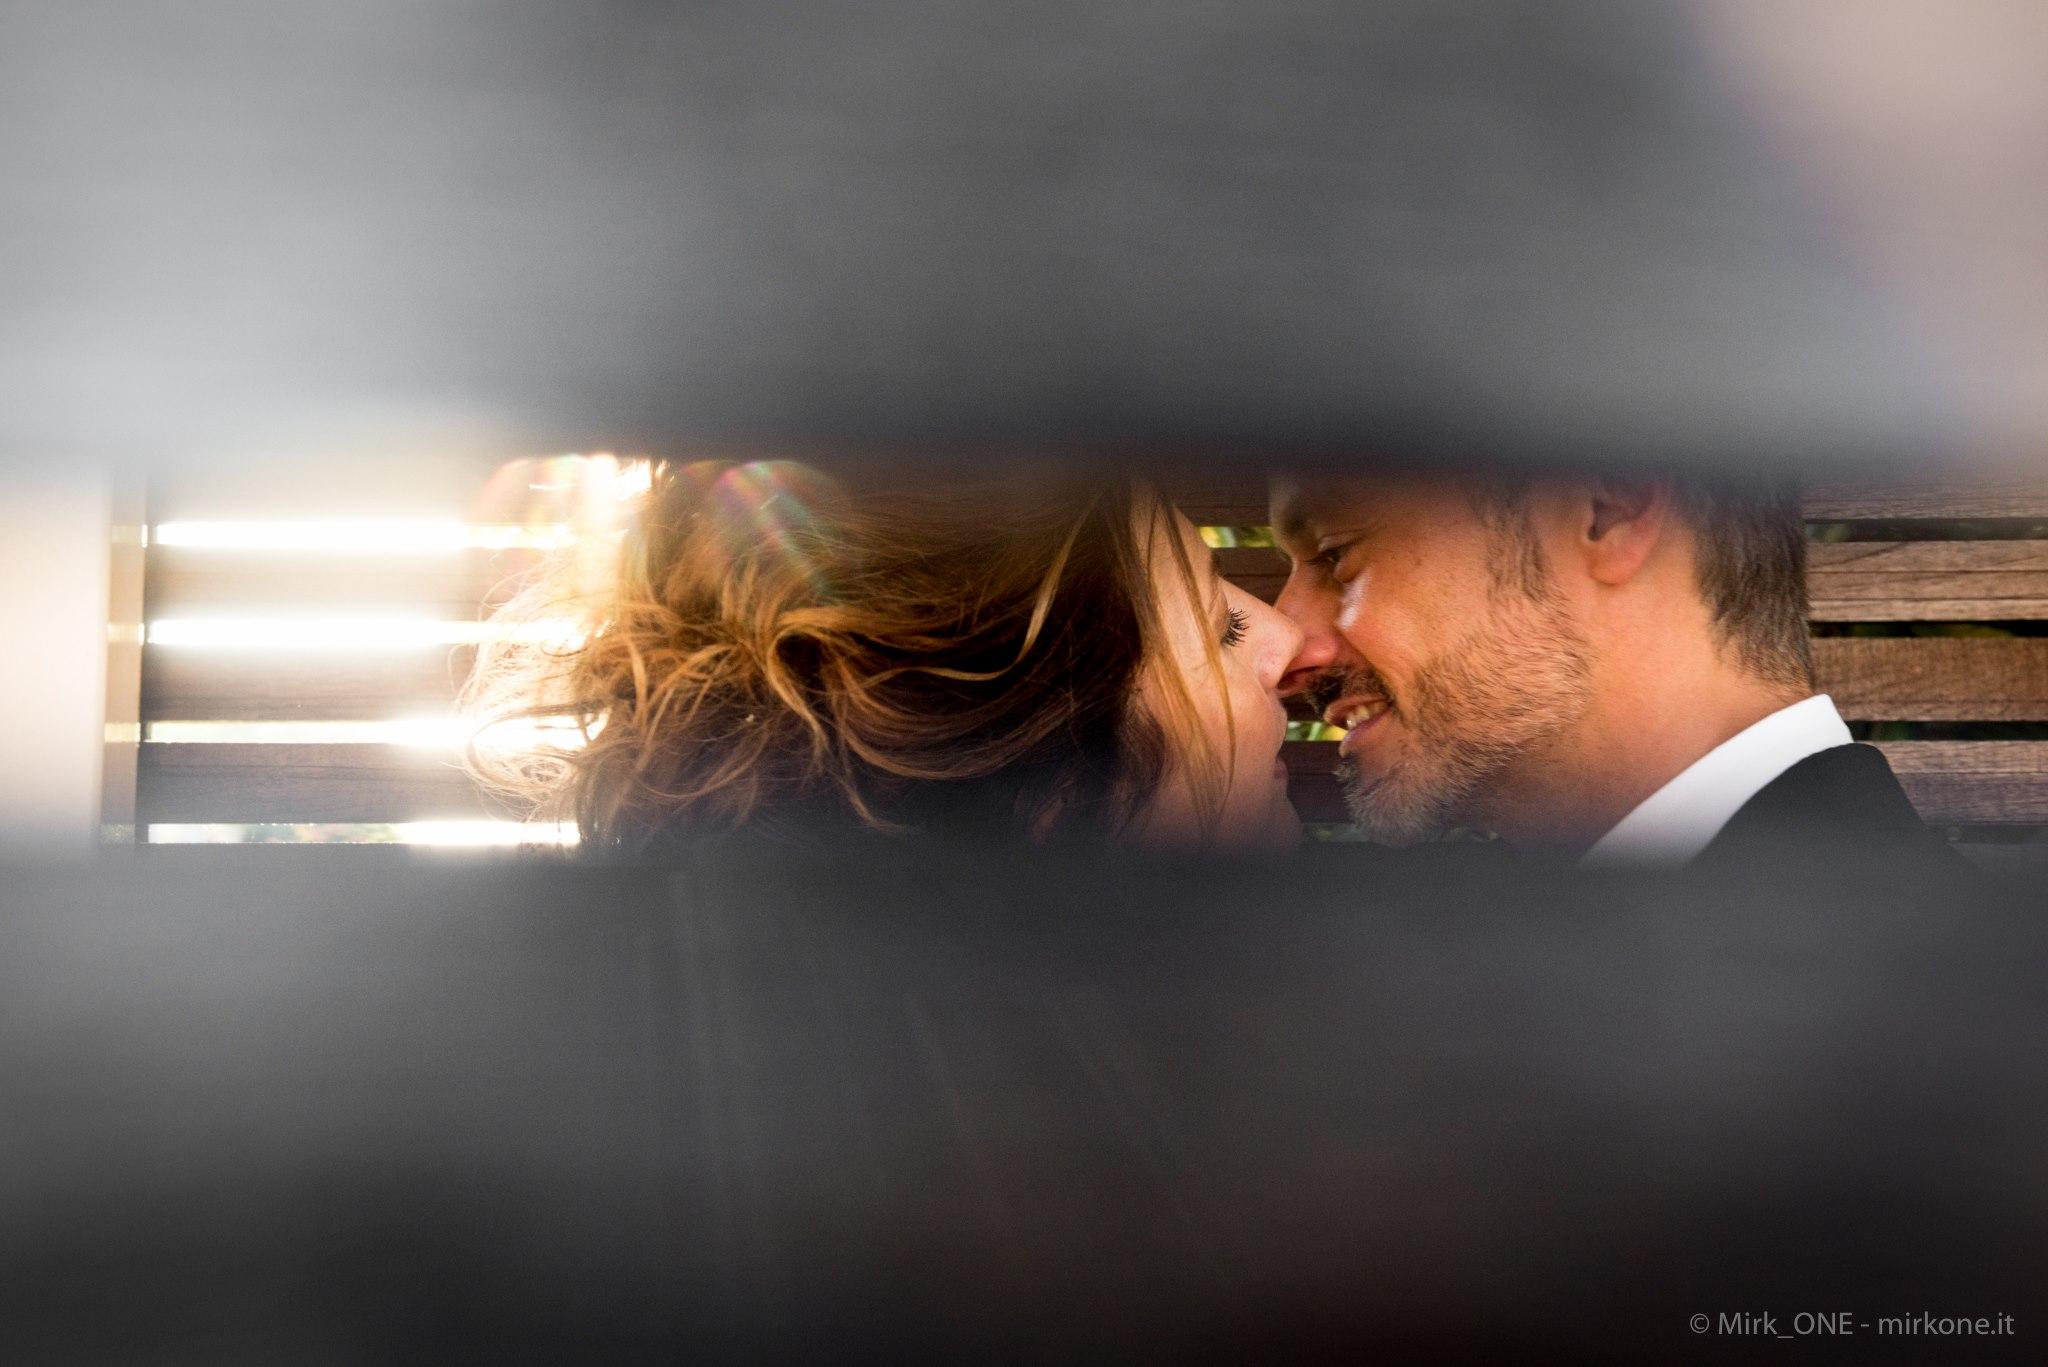 https://lnx.mirkone.it/wp-content/uploads/2015/07/mirk_ONE-fotografo-matrimonio-00110.jpg